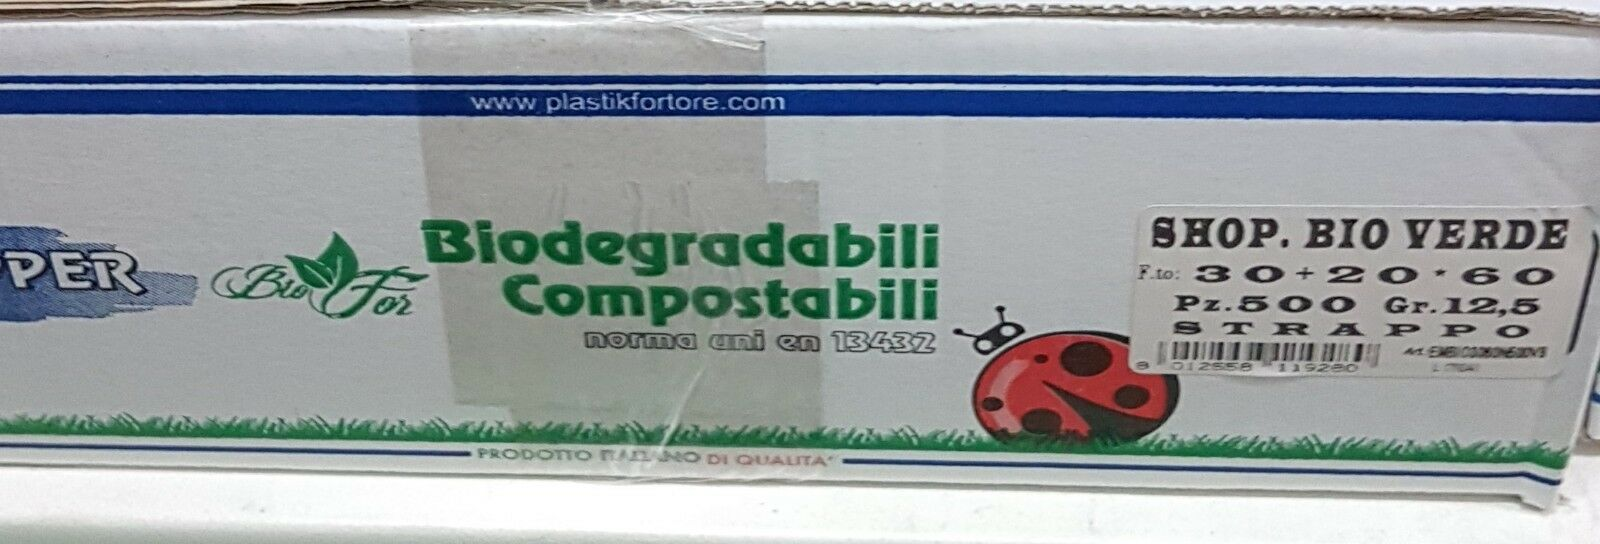 500 BUSTE SHOPPER 30+20x60 BIODEGRADABILI verde COMPOSTABILI BIO 12,5 GR